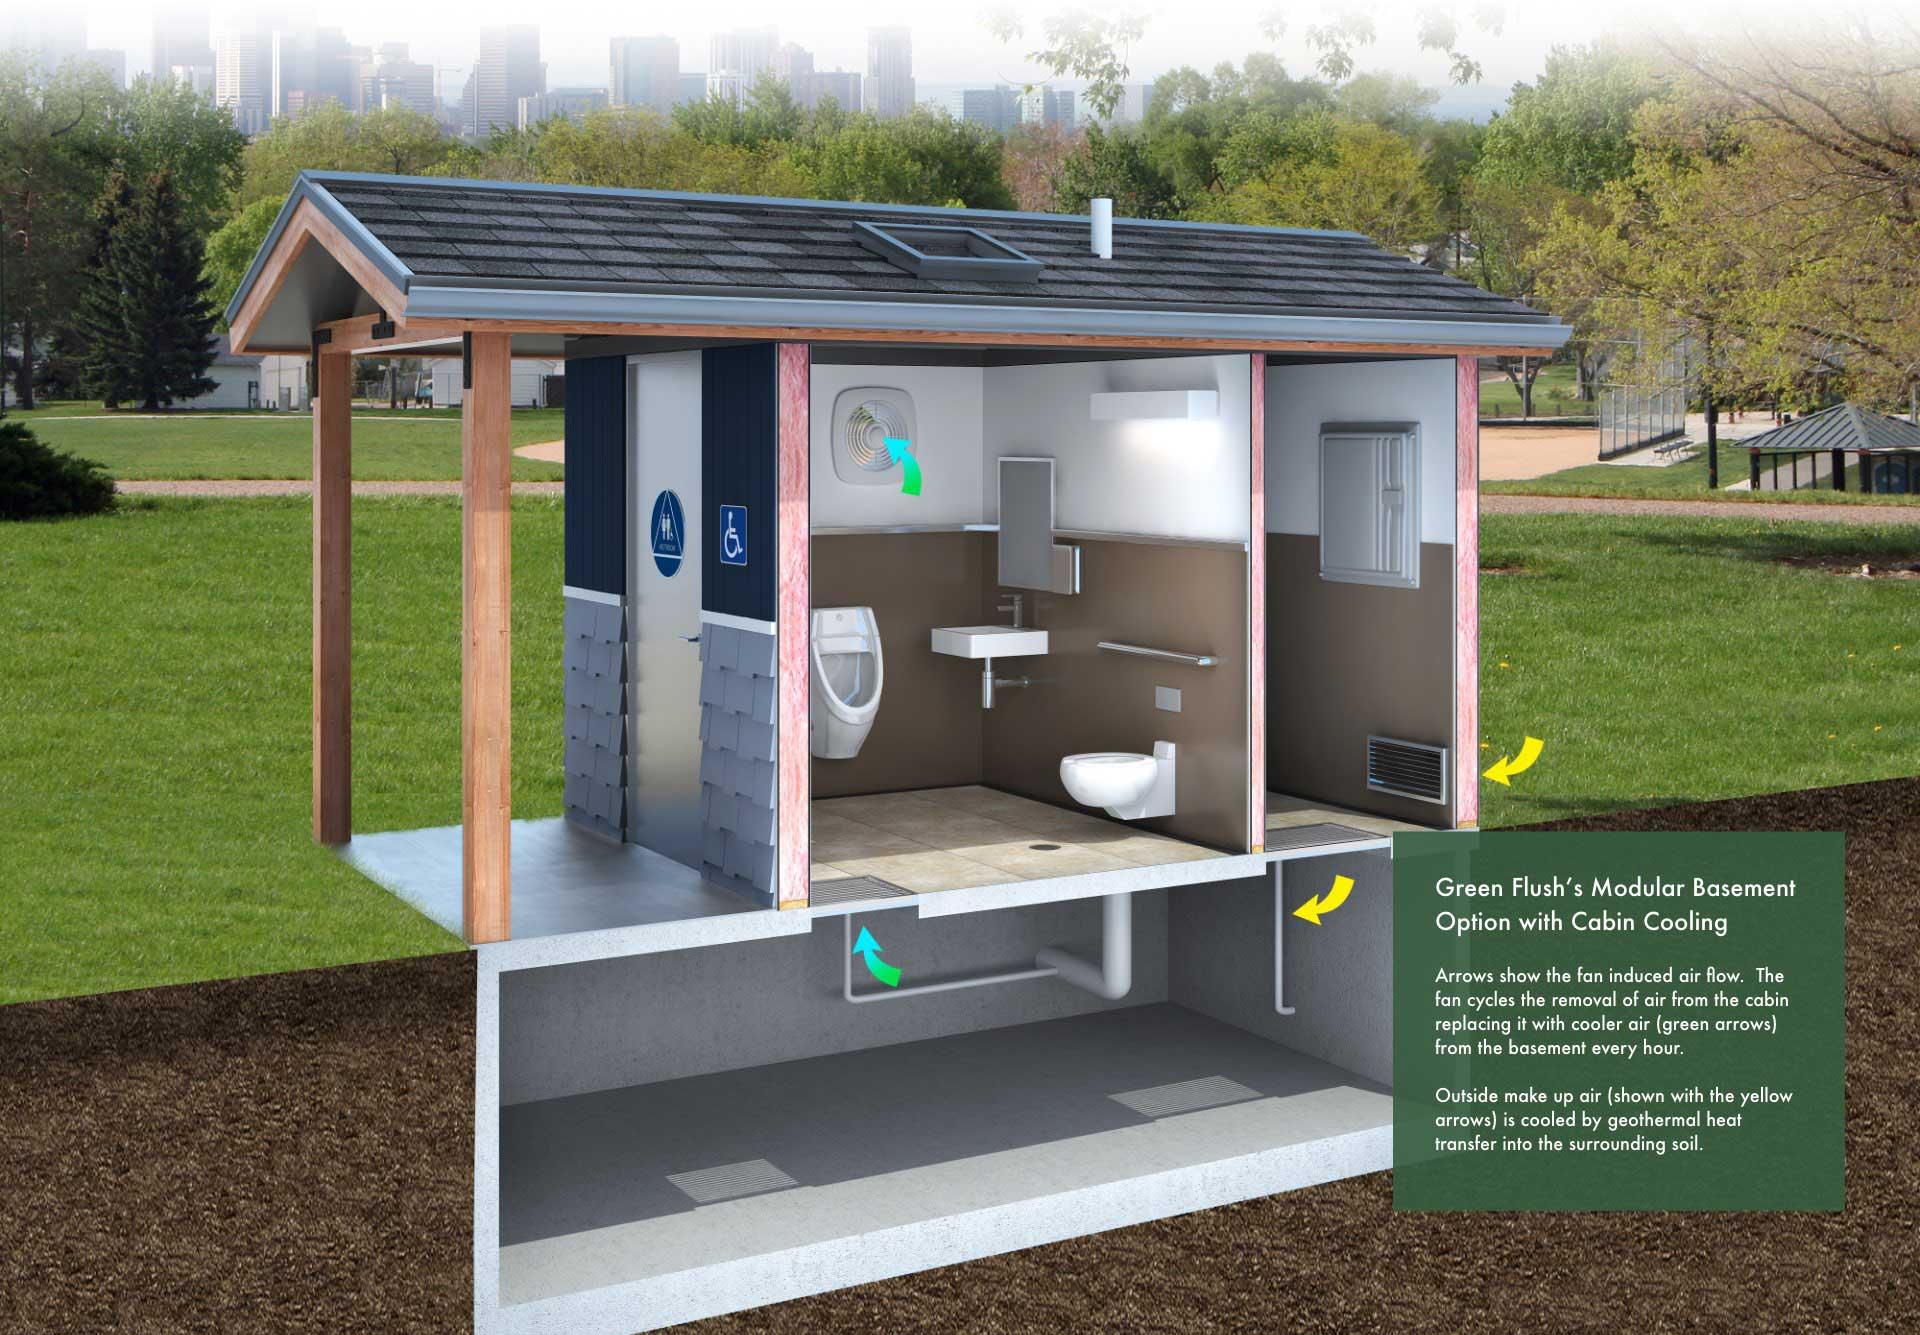 Diagram of Green Flush's modular basement options in Vancouver, WA